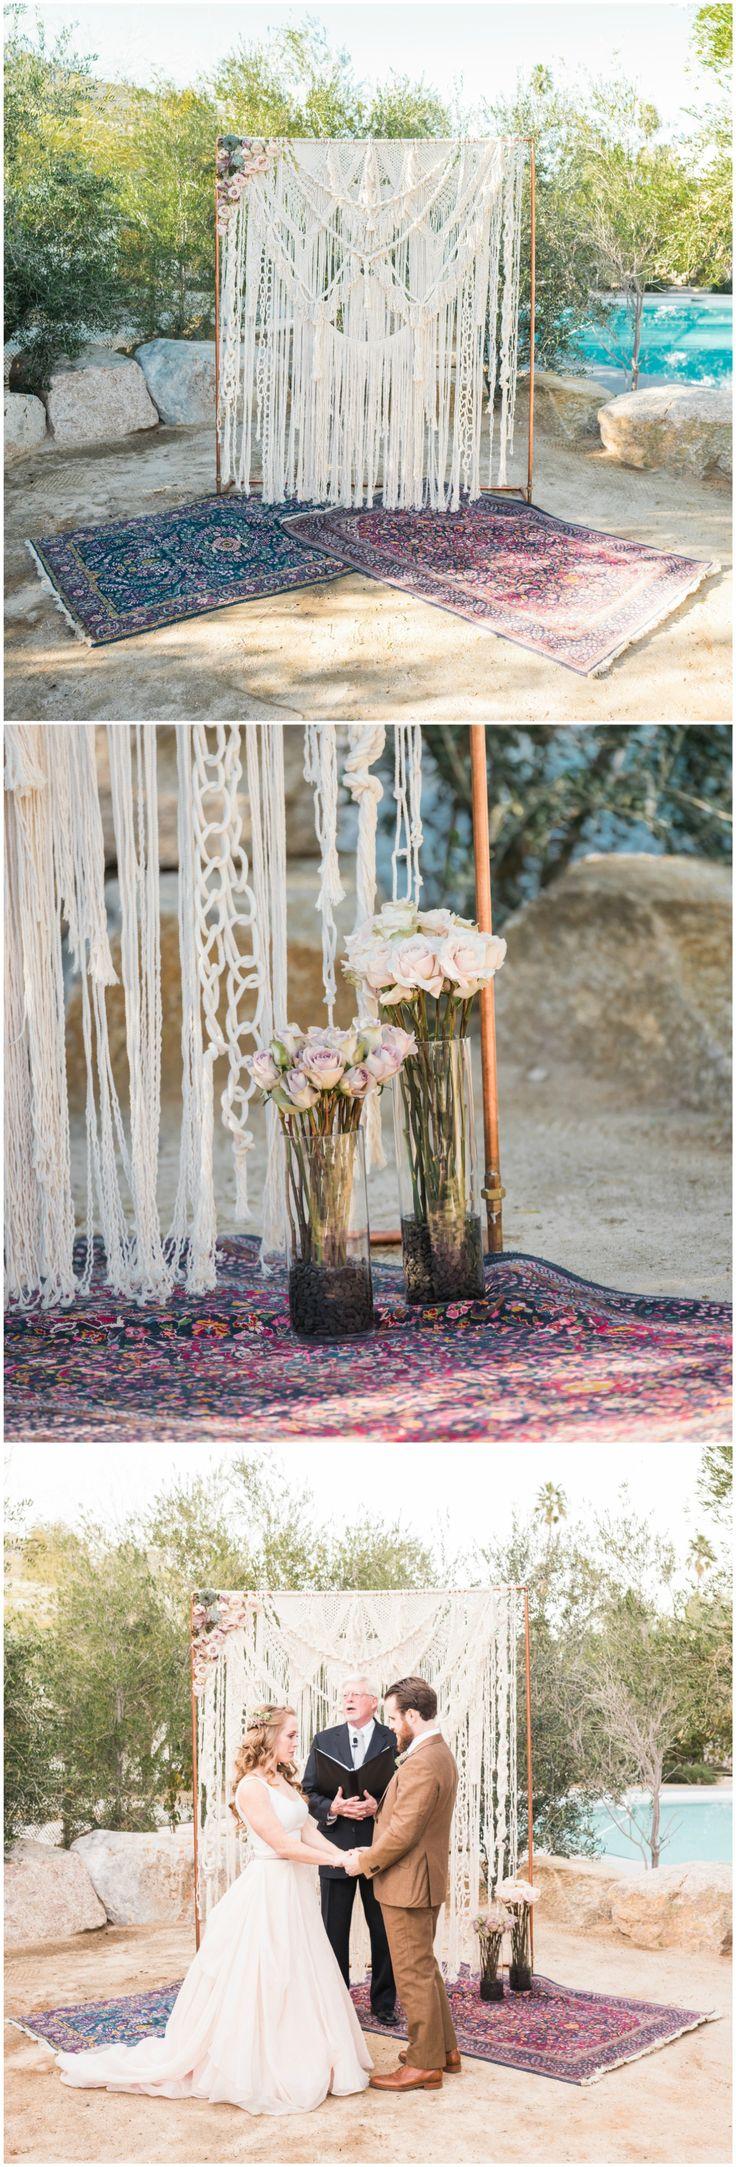 Outdoor boho wedding ceremony, colorful rugs, roses, crochet arbor, California wedding // Randy + Ashley